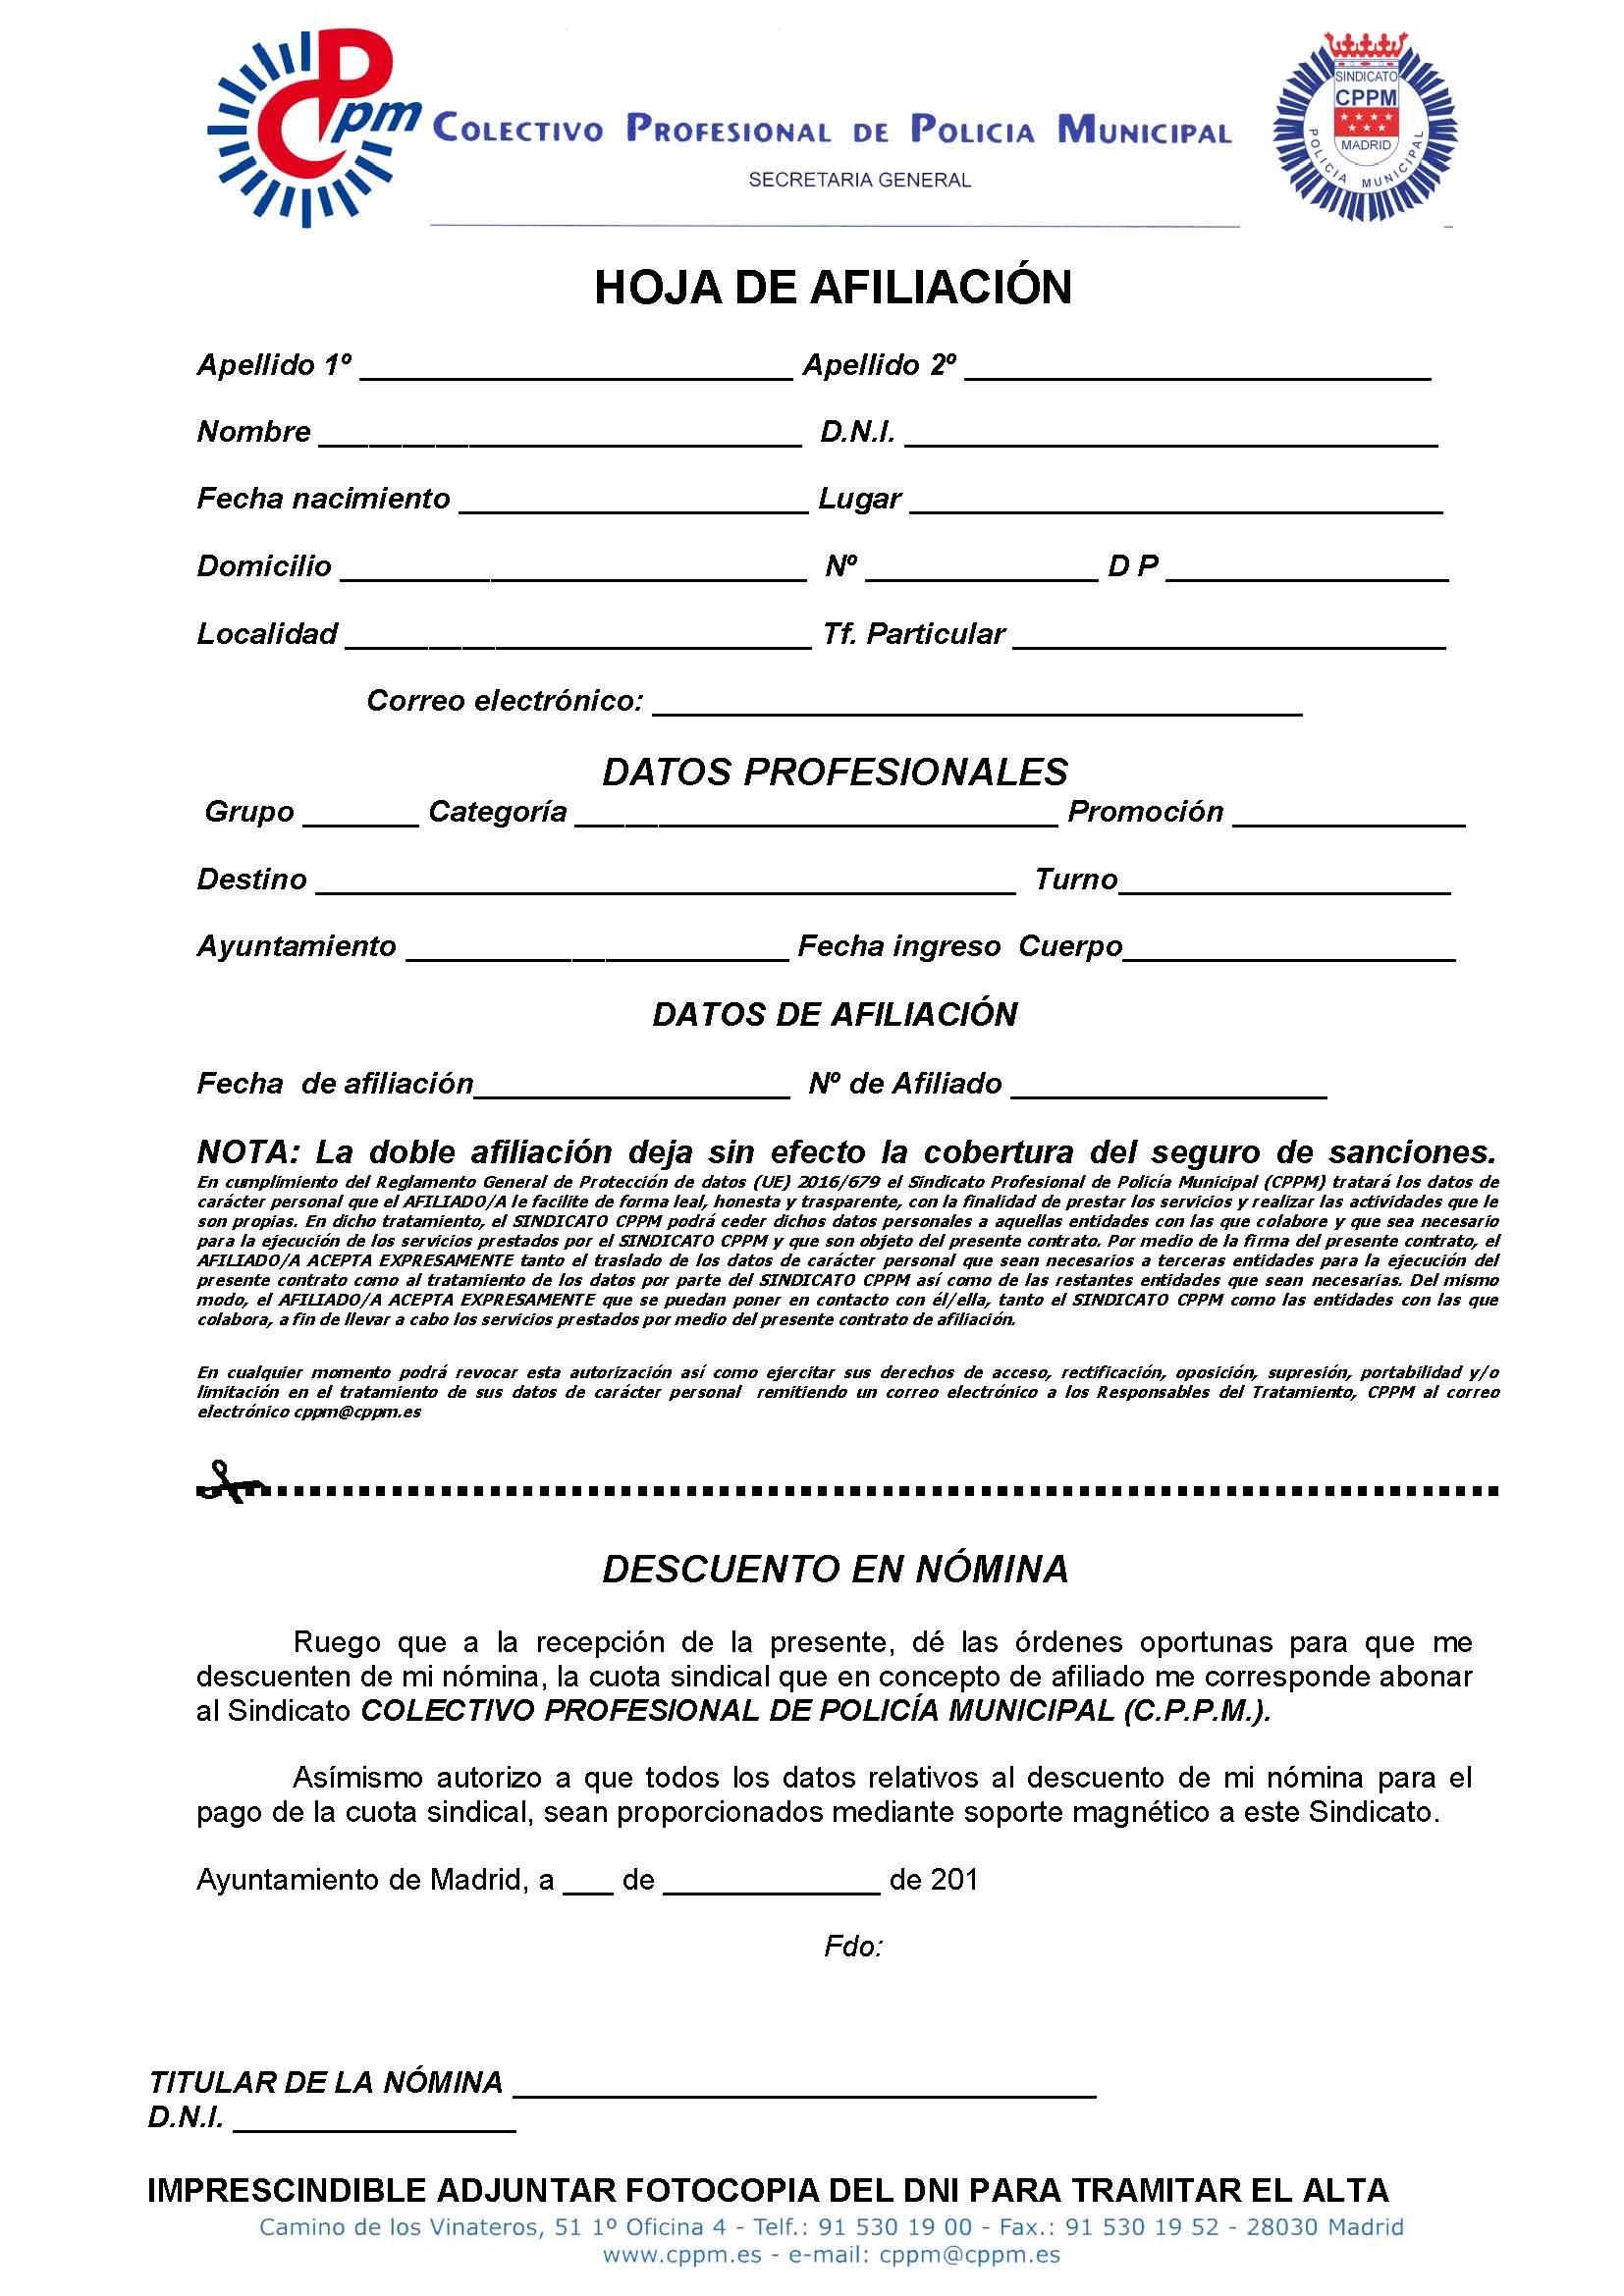 Hoja afiliación sindicato CPPM descuento en nómina Ayto Madrid